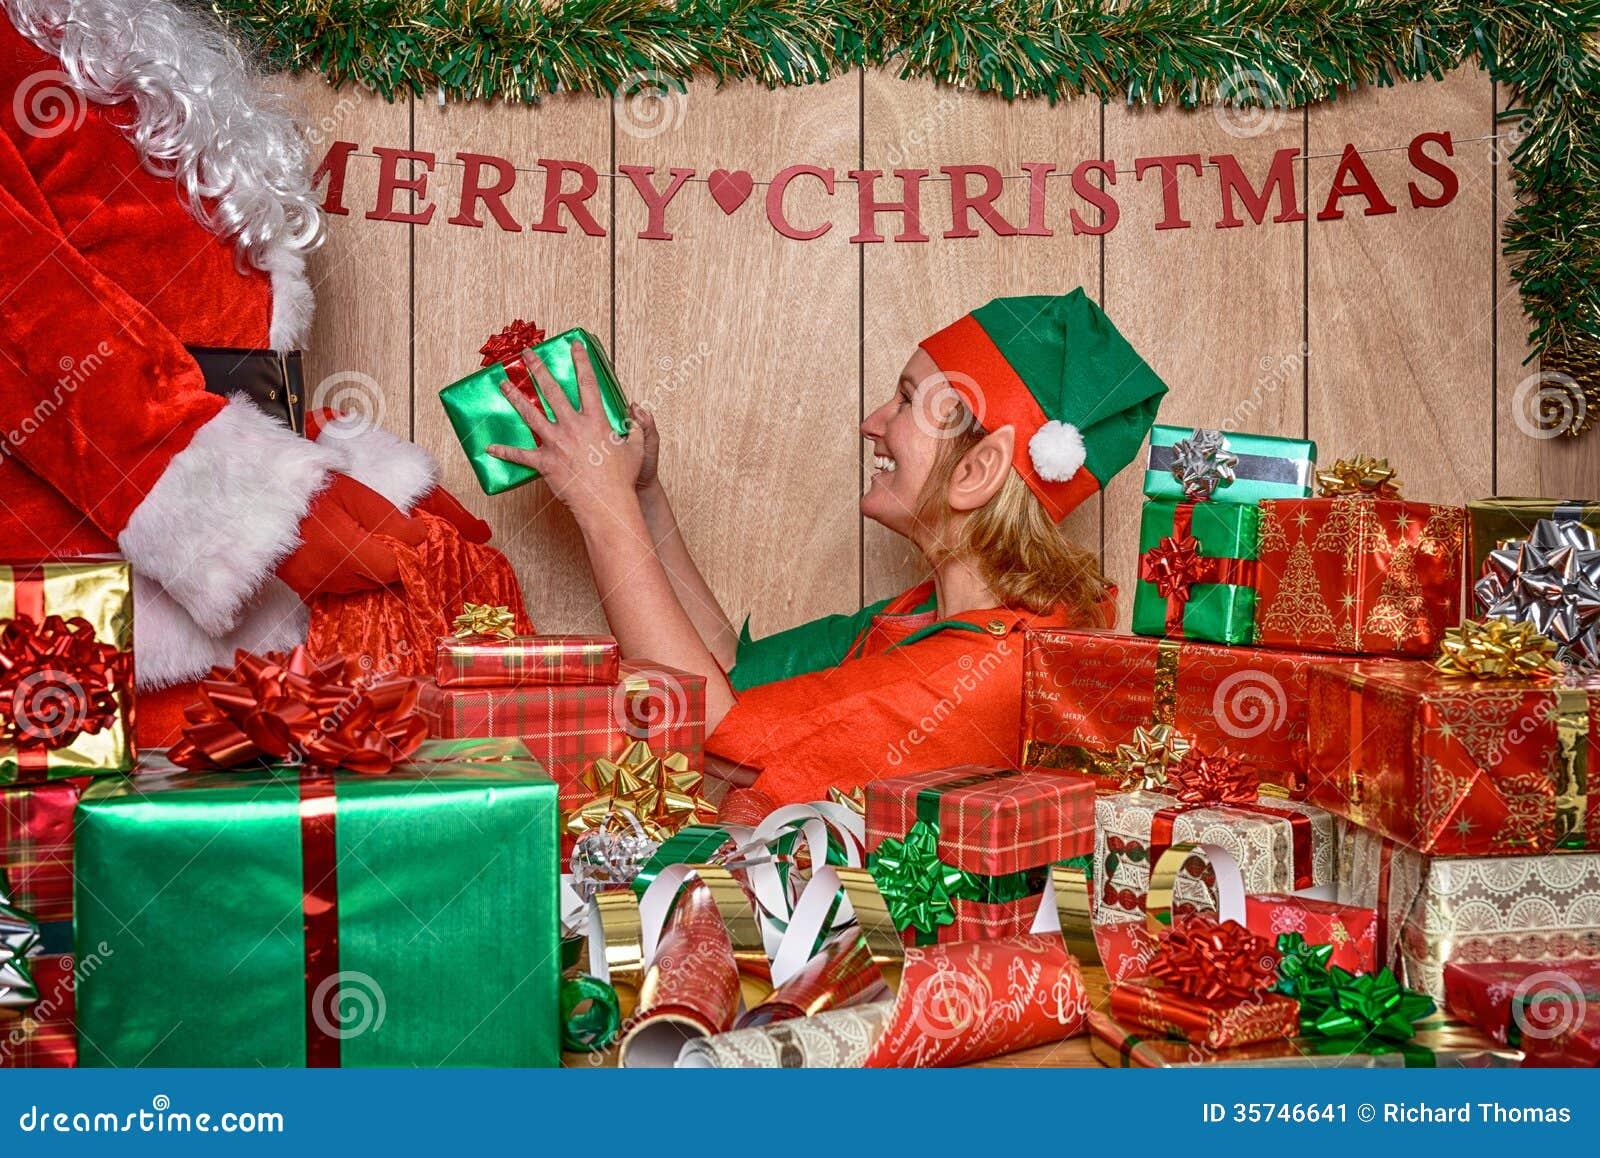 Elf Puttings Presents In Santa's Sack Stock Image - Image: 35746641